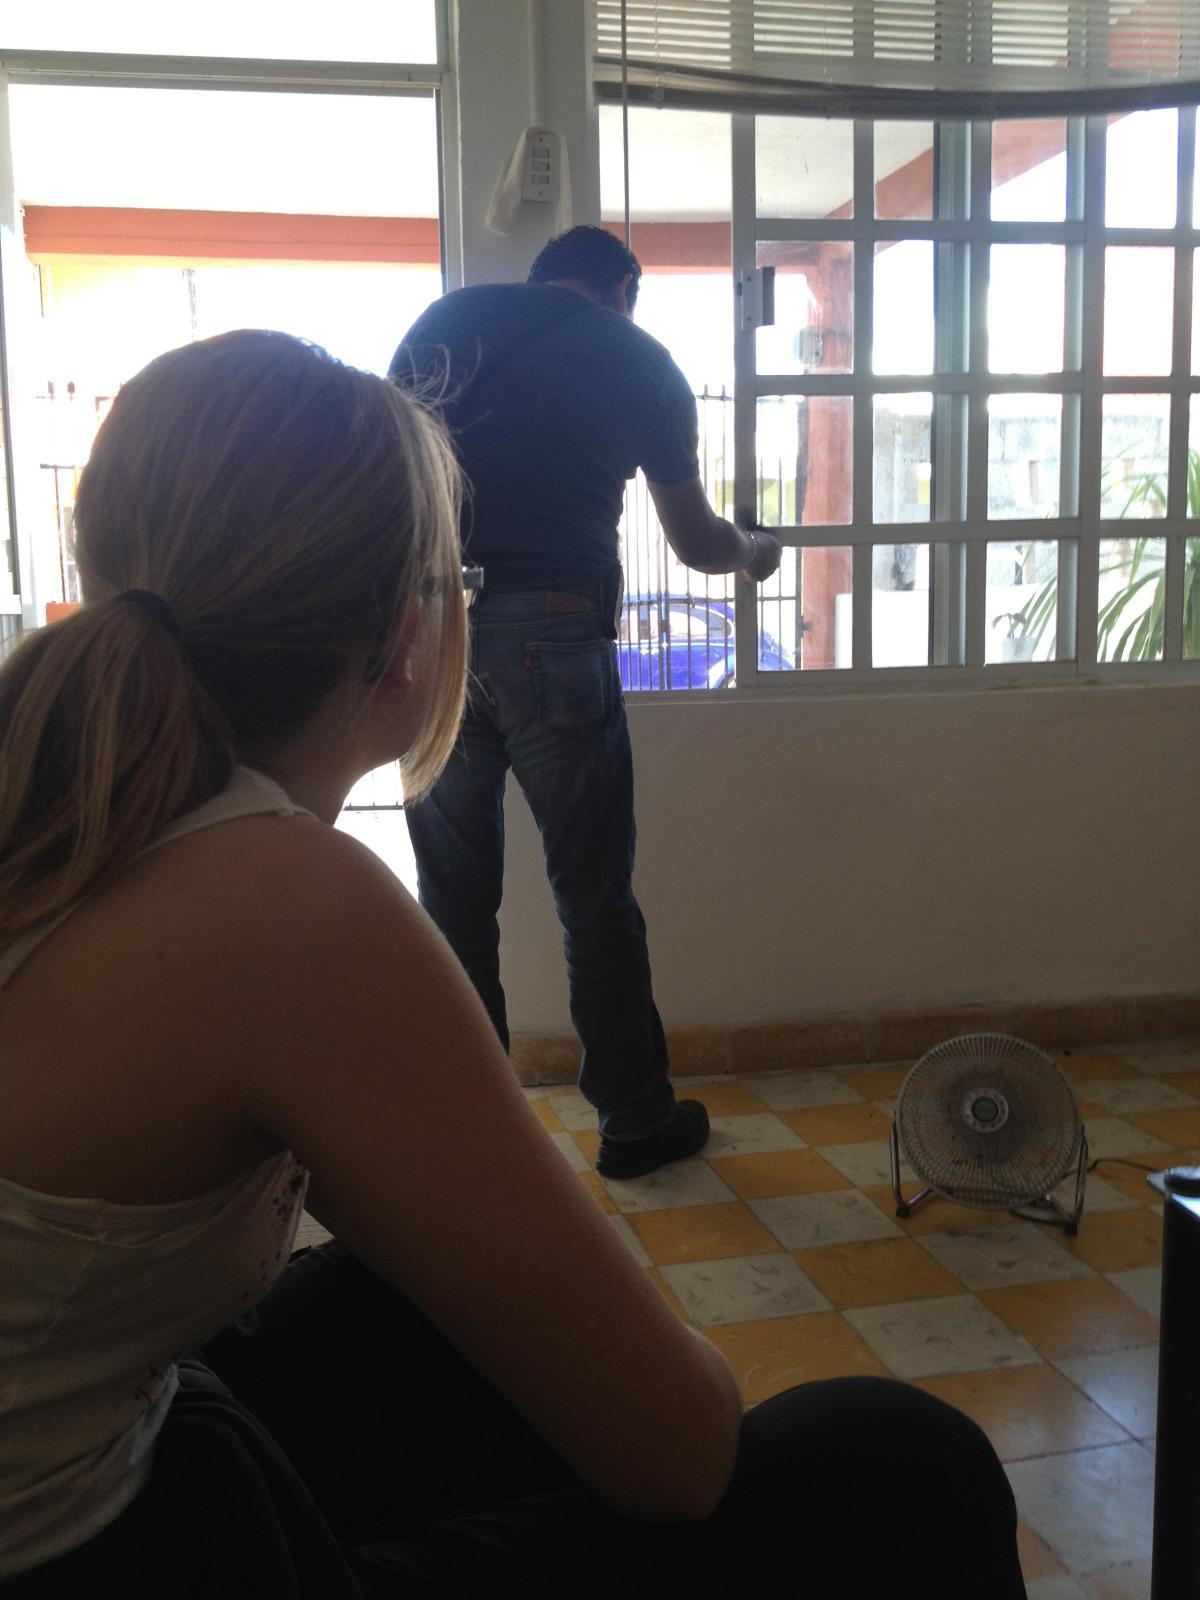 Our Robbery in Progreso, Yucatan 2012: Photo Gallery